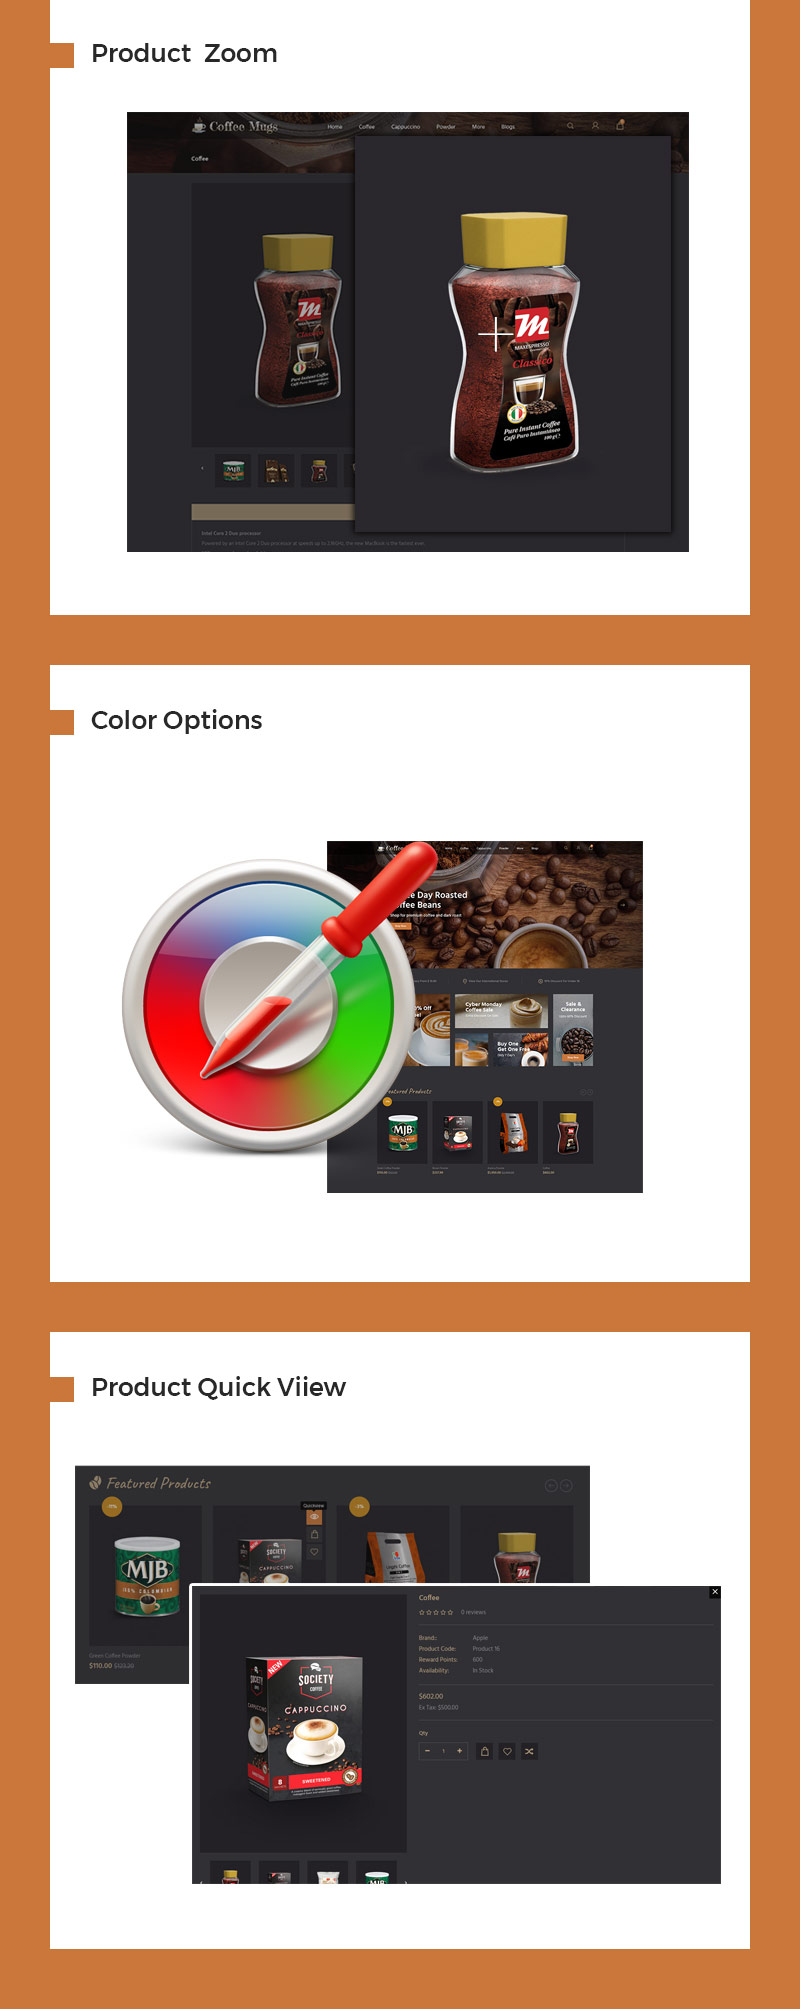 coffeemug-features-3.jpg